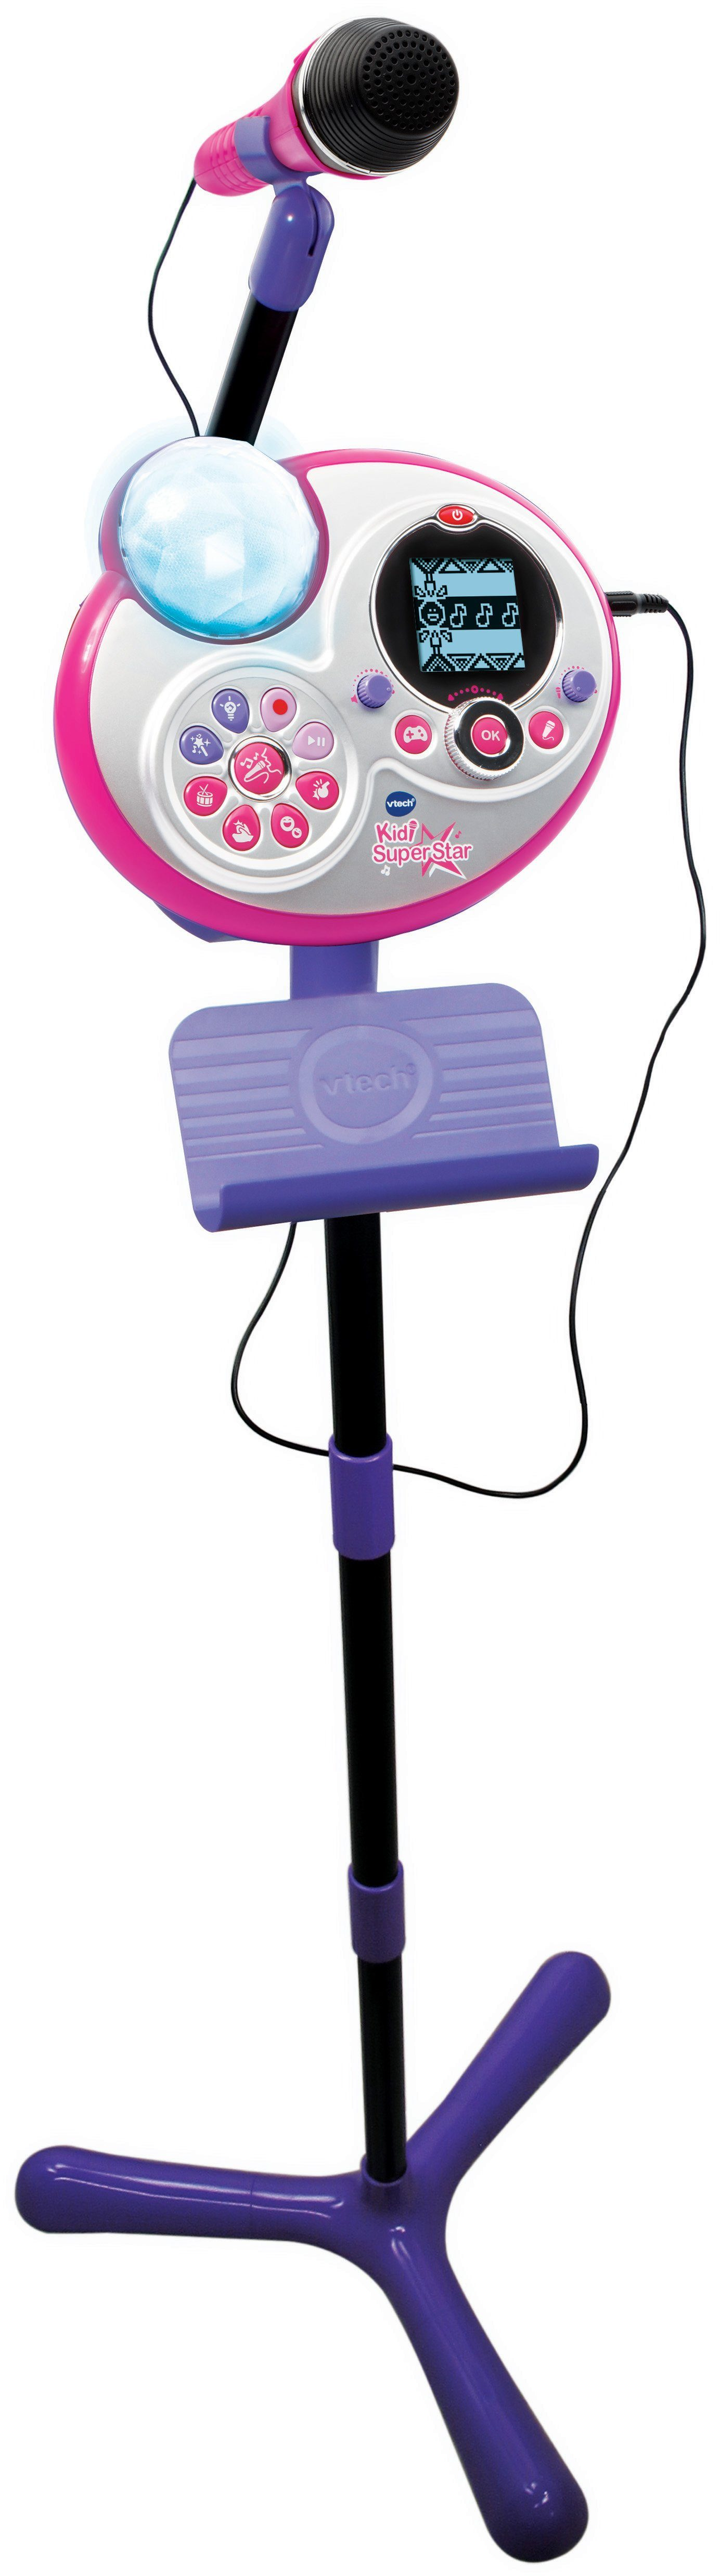 VTech Mikrofon mit Aufnahmefunktion, »Kidi Super Star«